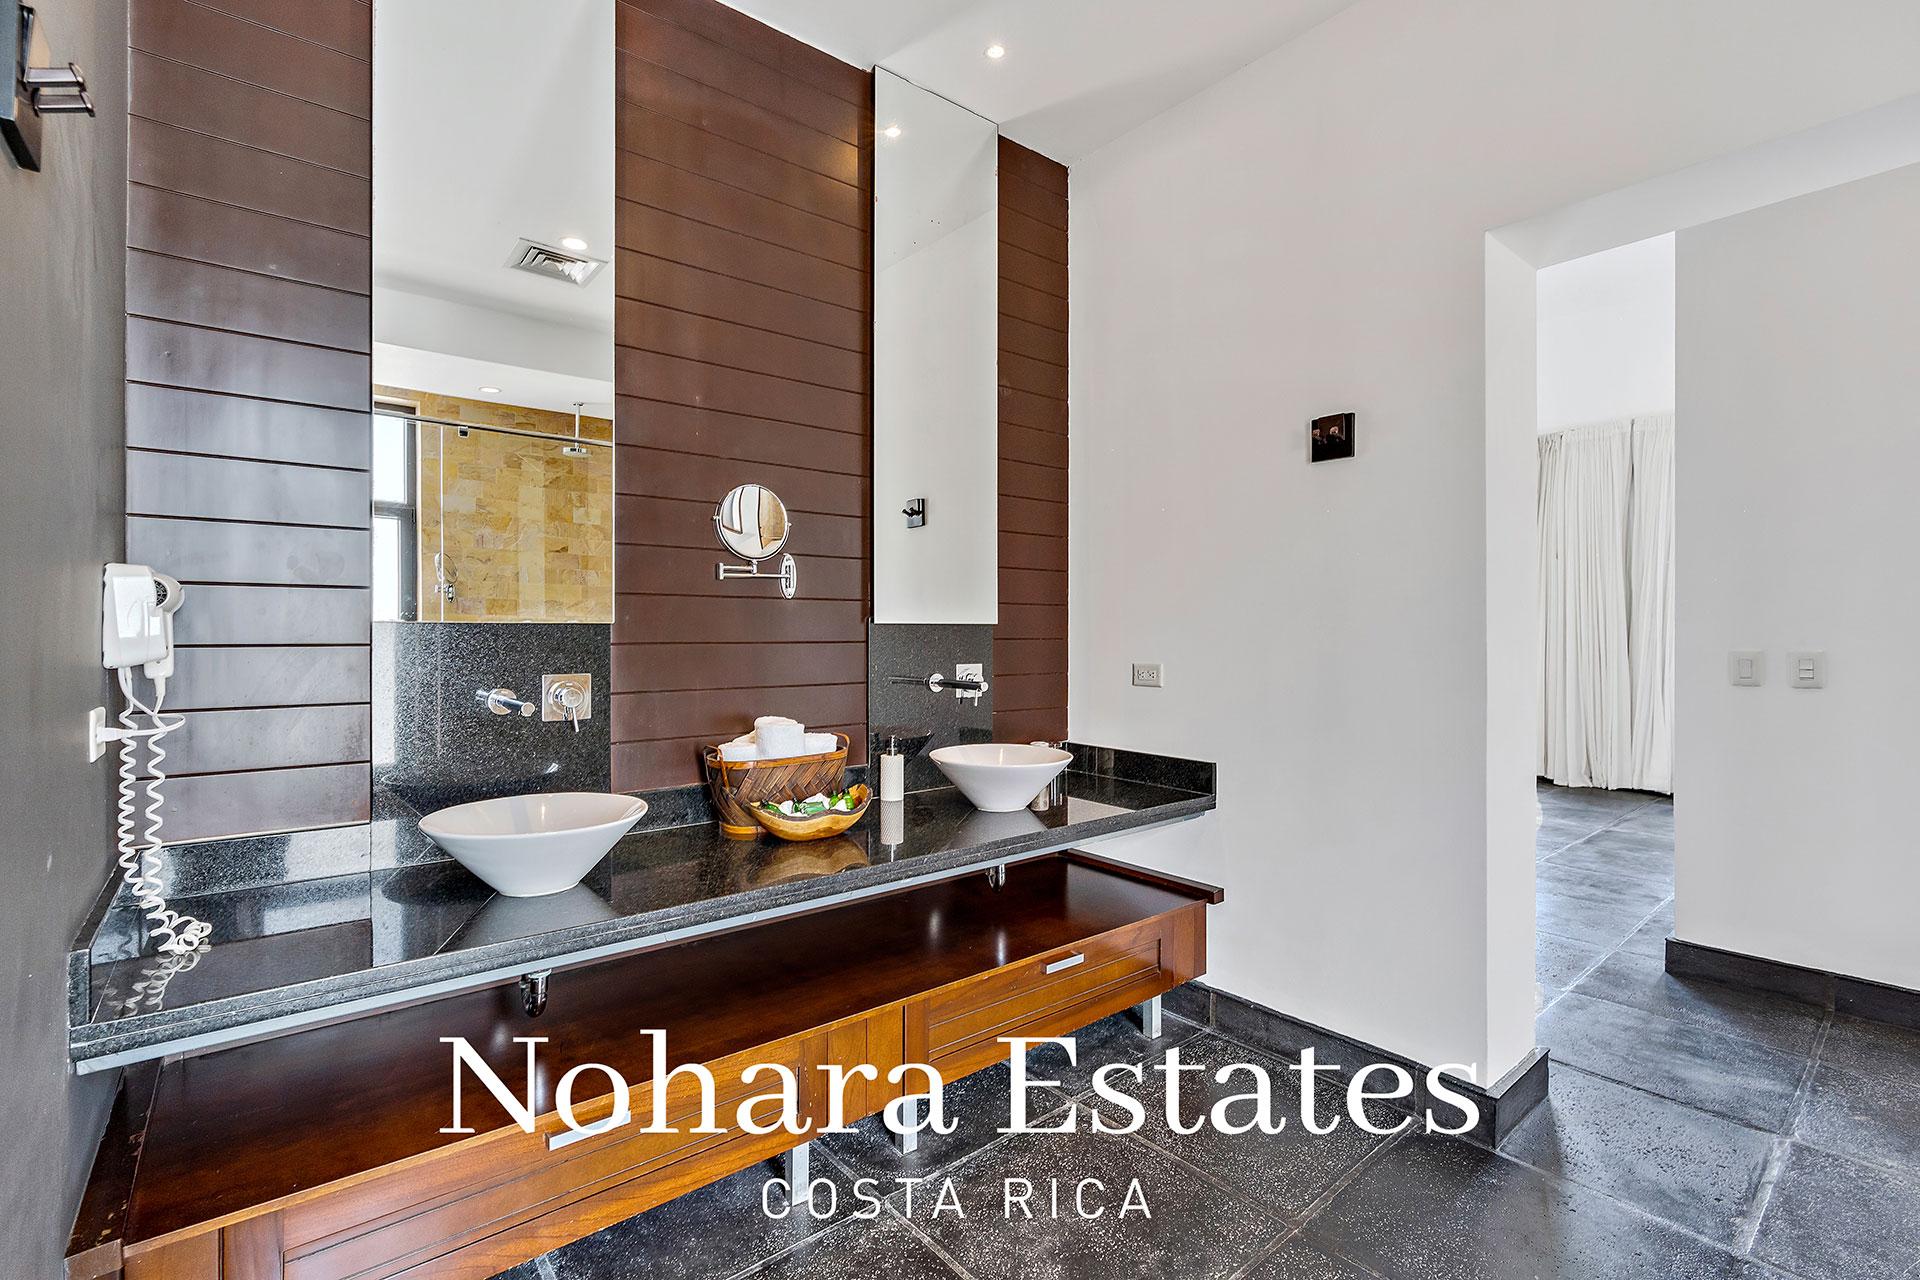 Nohara Estates Costa Rica 125 Apartment Quepos Los Altos 4